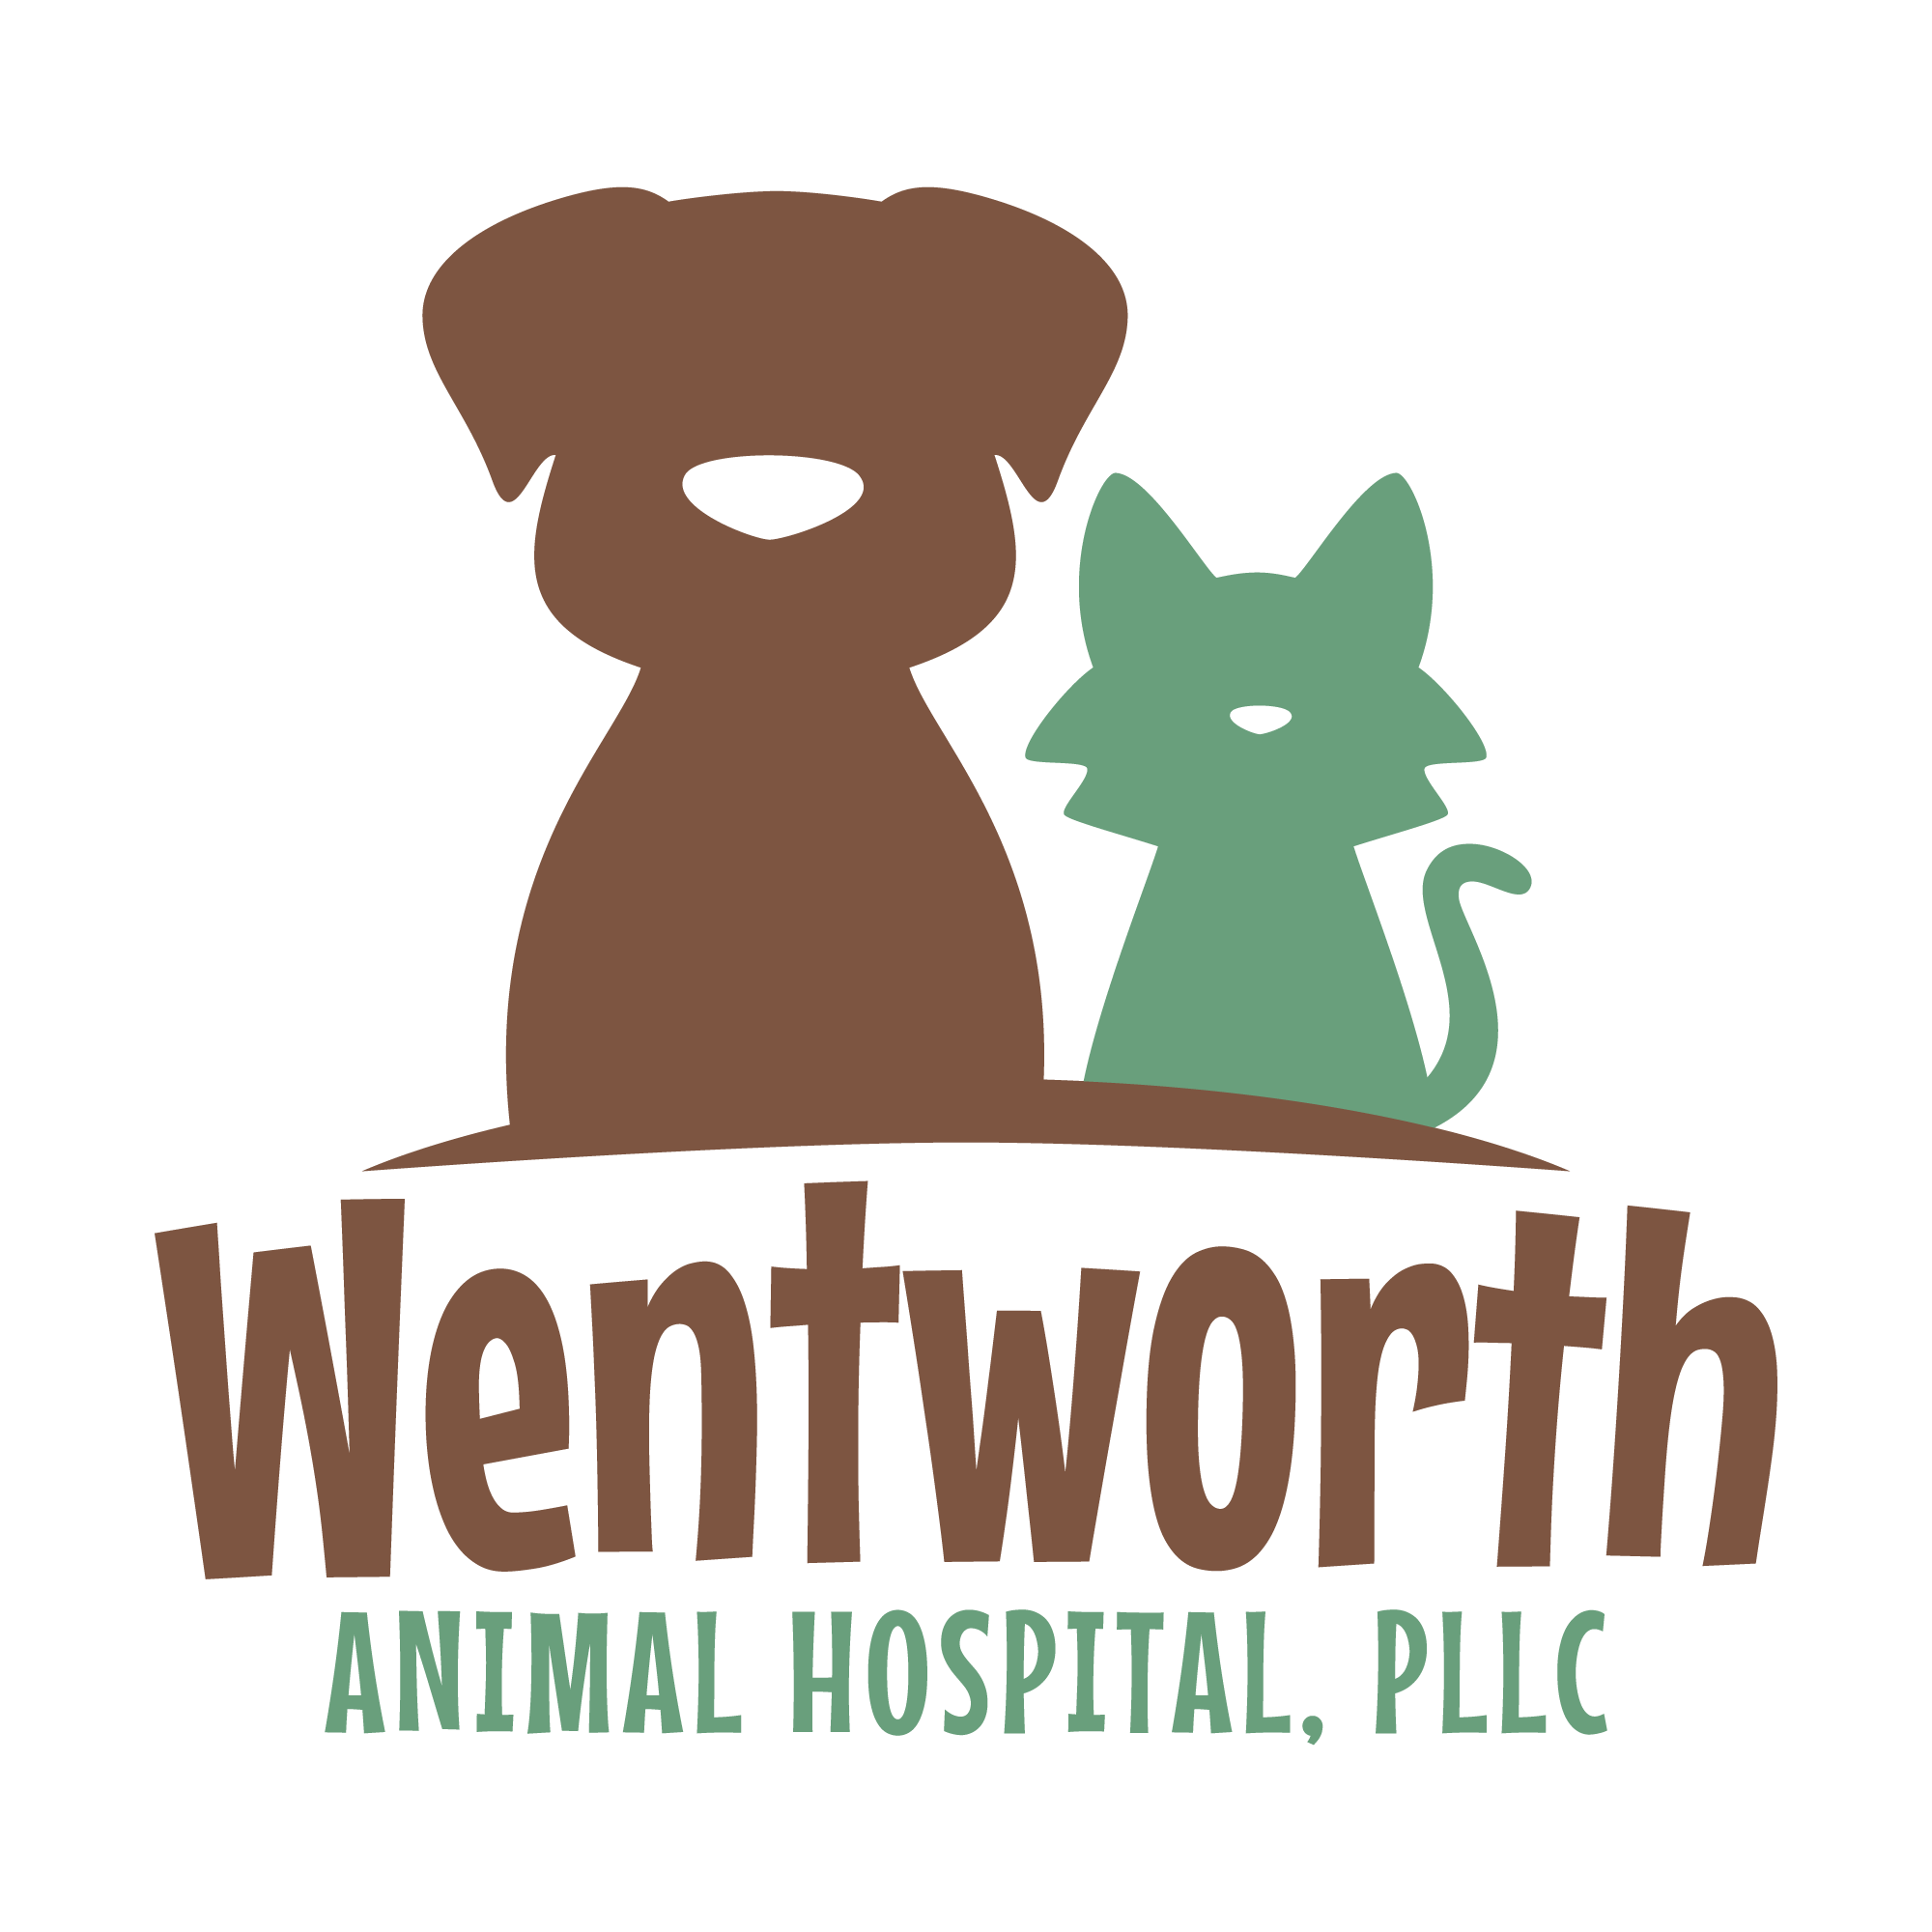 Wentworth animal hospital pet. Dog and cat bath clipart